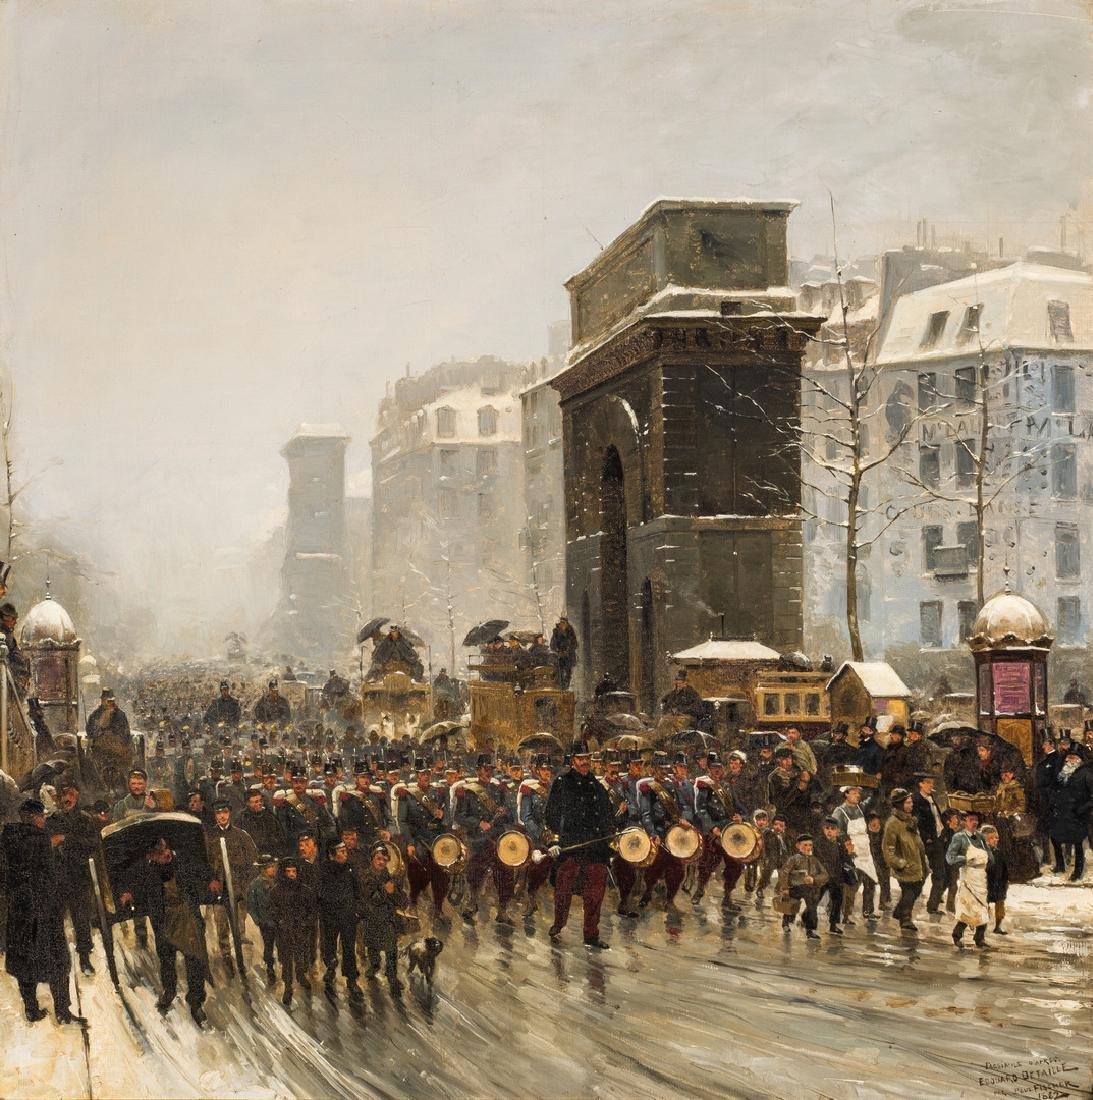 Paul G. Fischer Oil, Military Parade